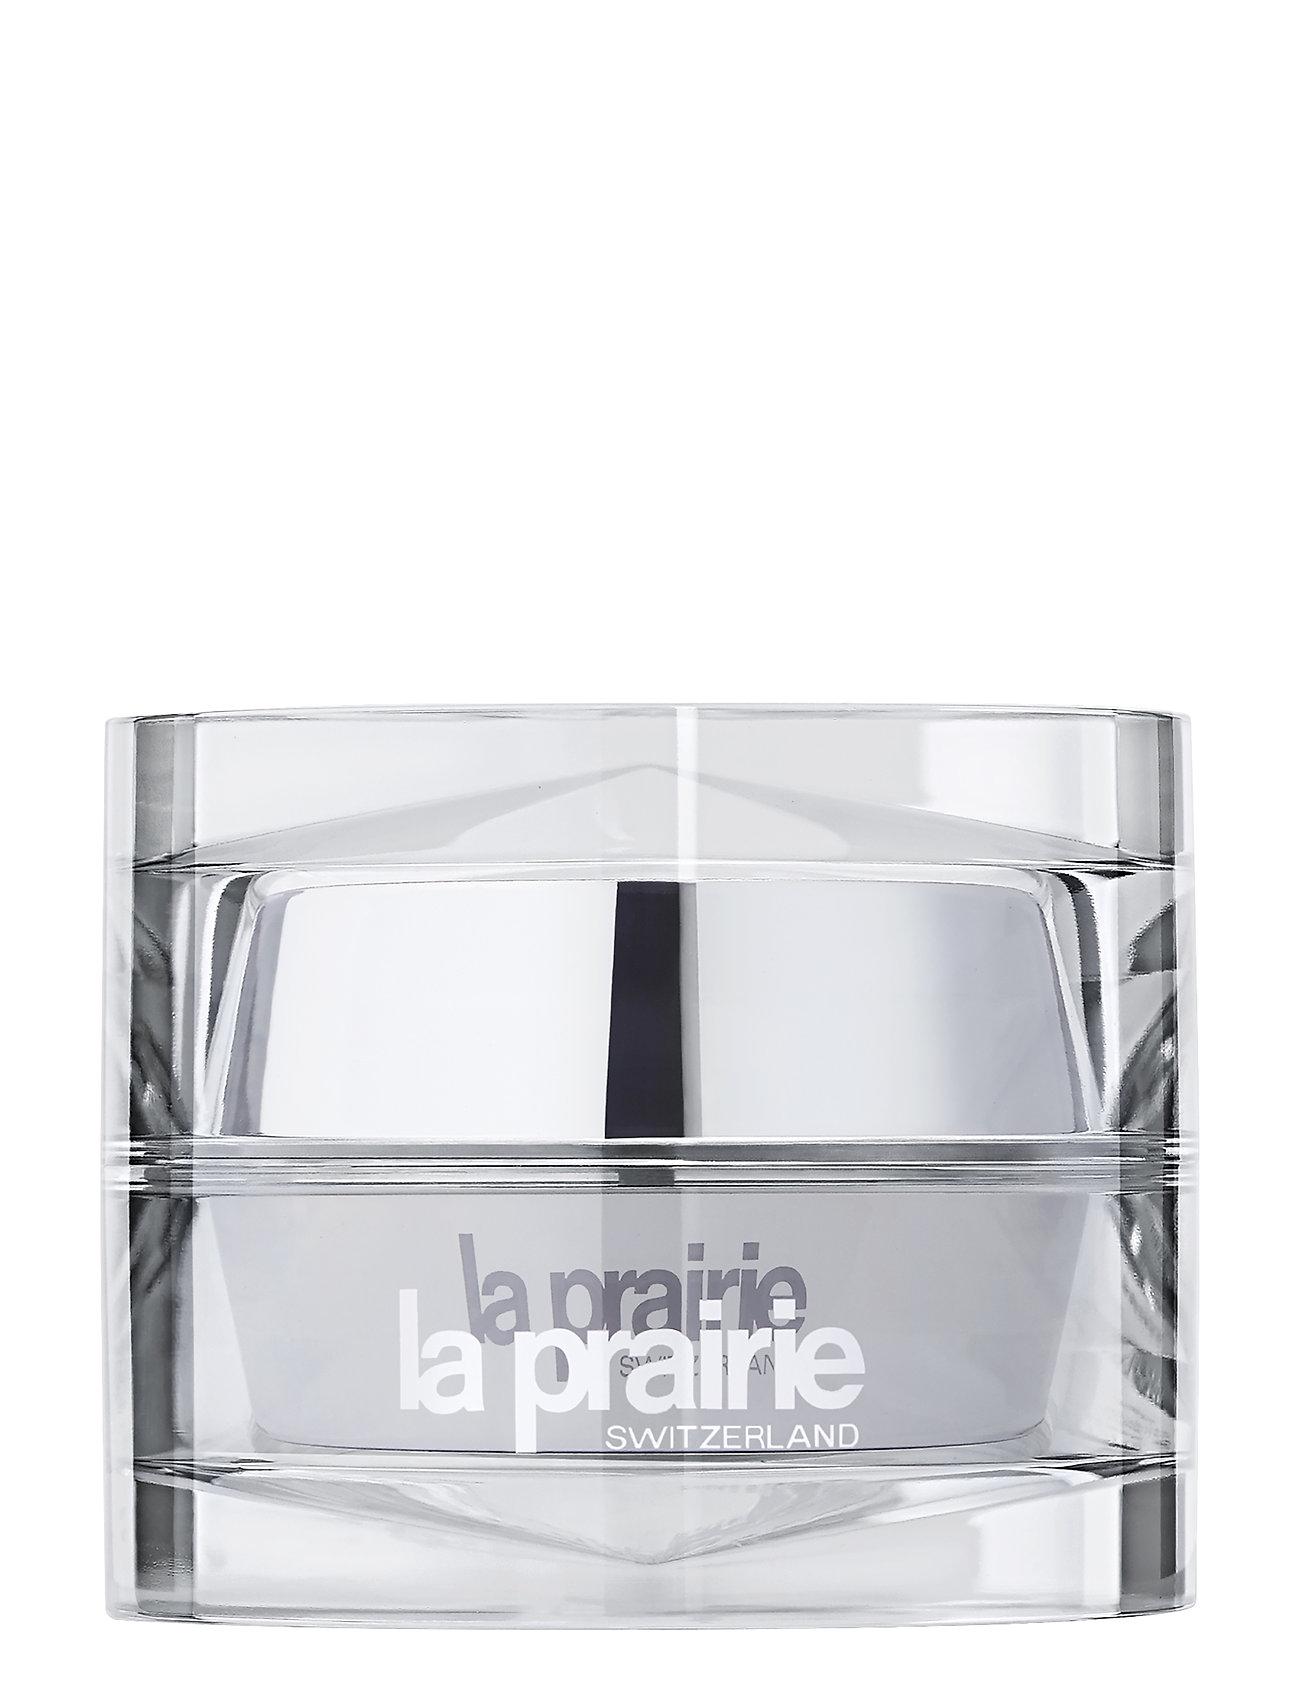 La Prairie PLATINUM RARE CELLULAR EYE CREAM - NO COLOR